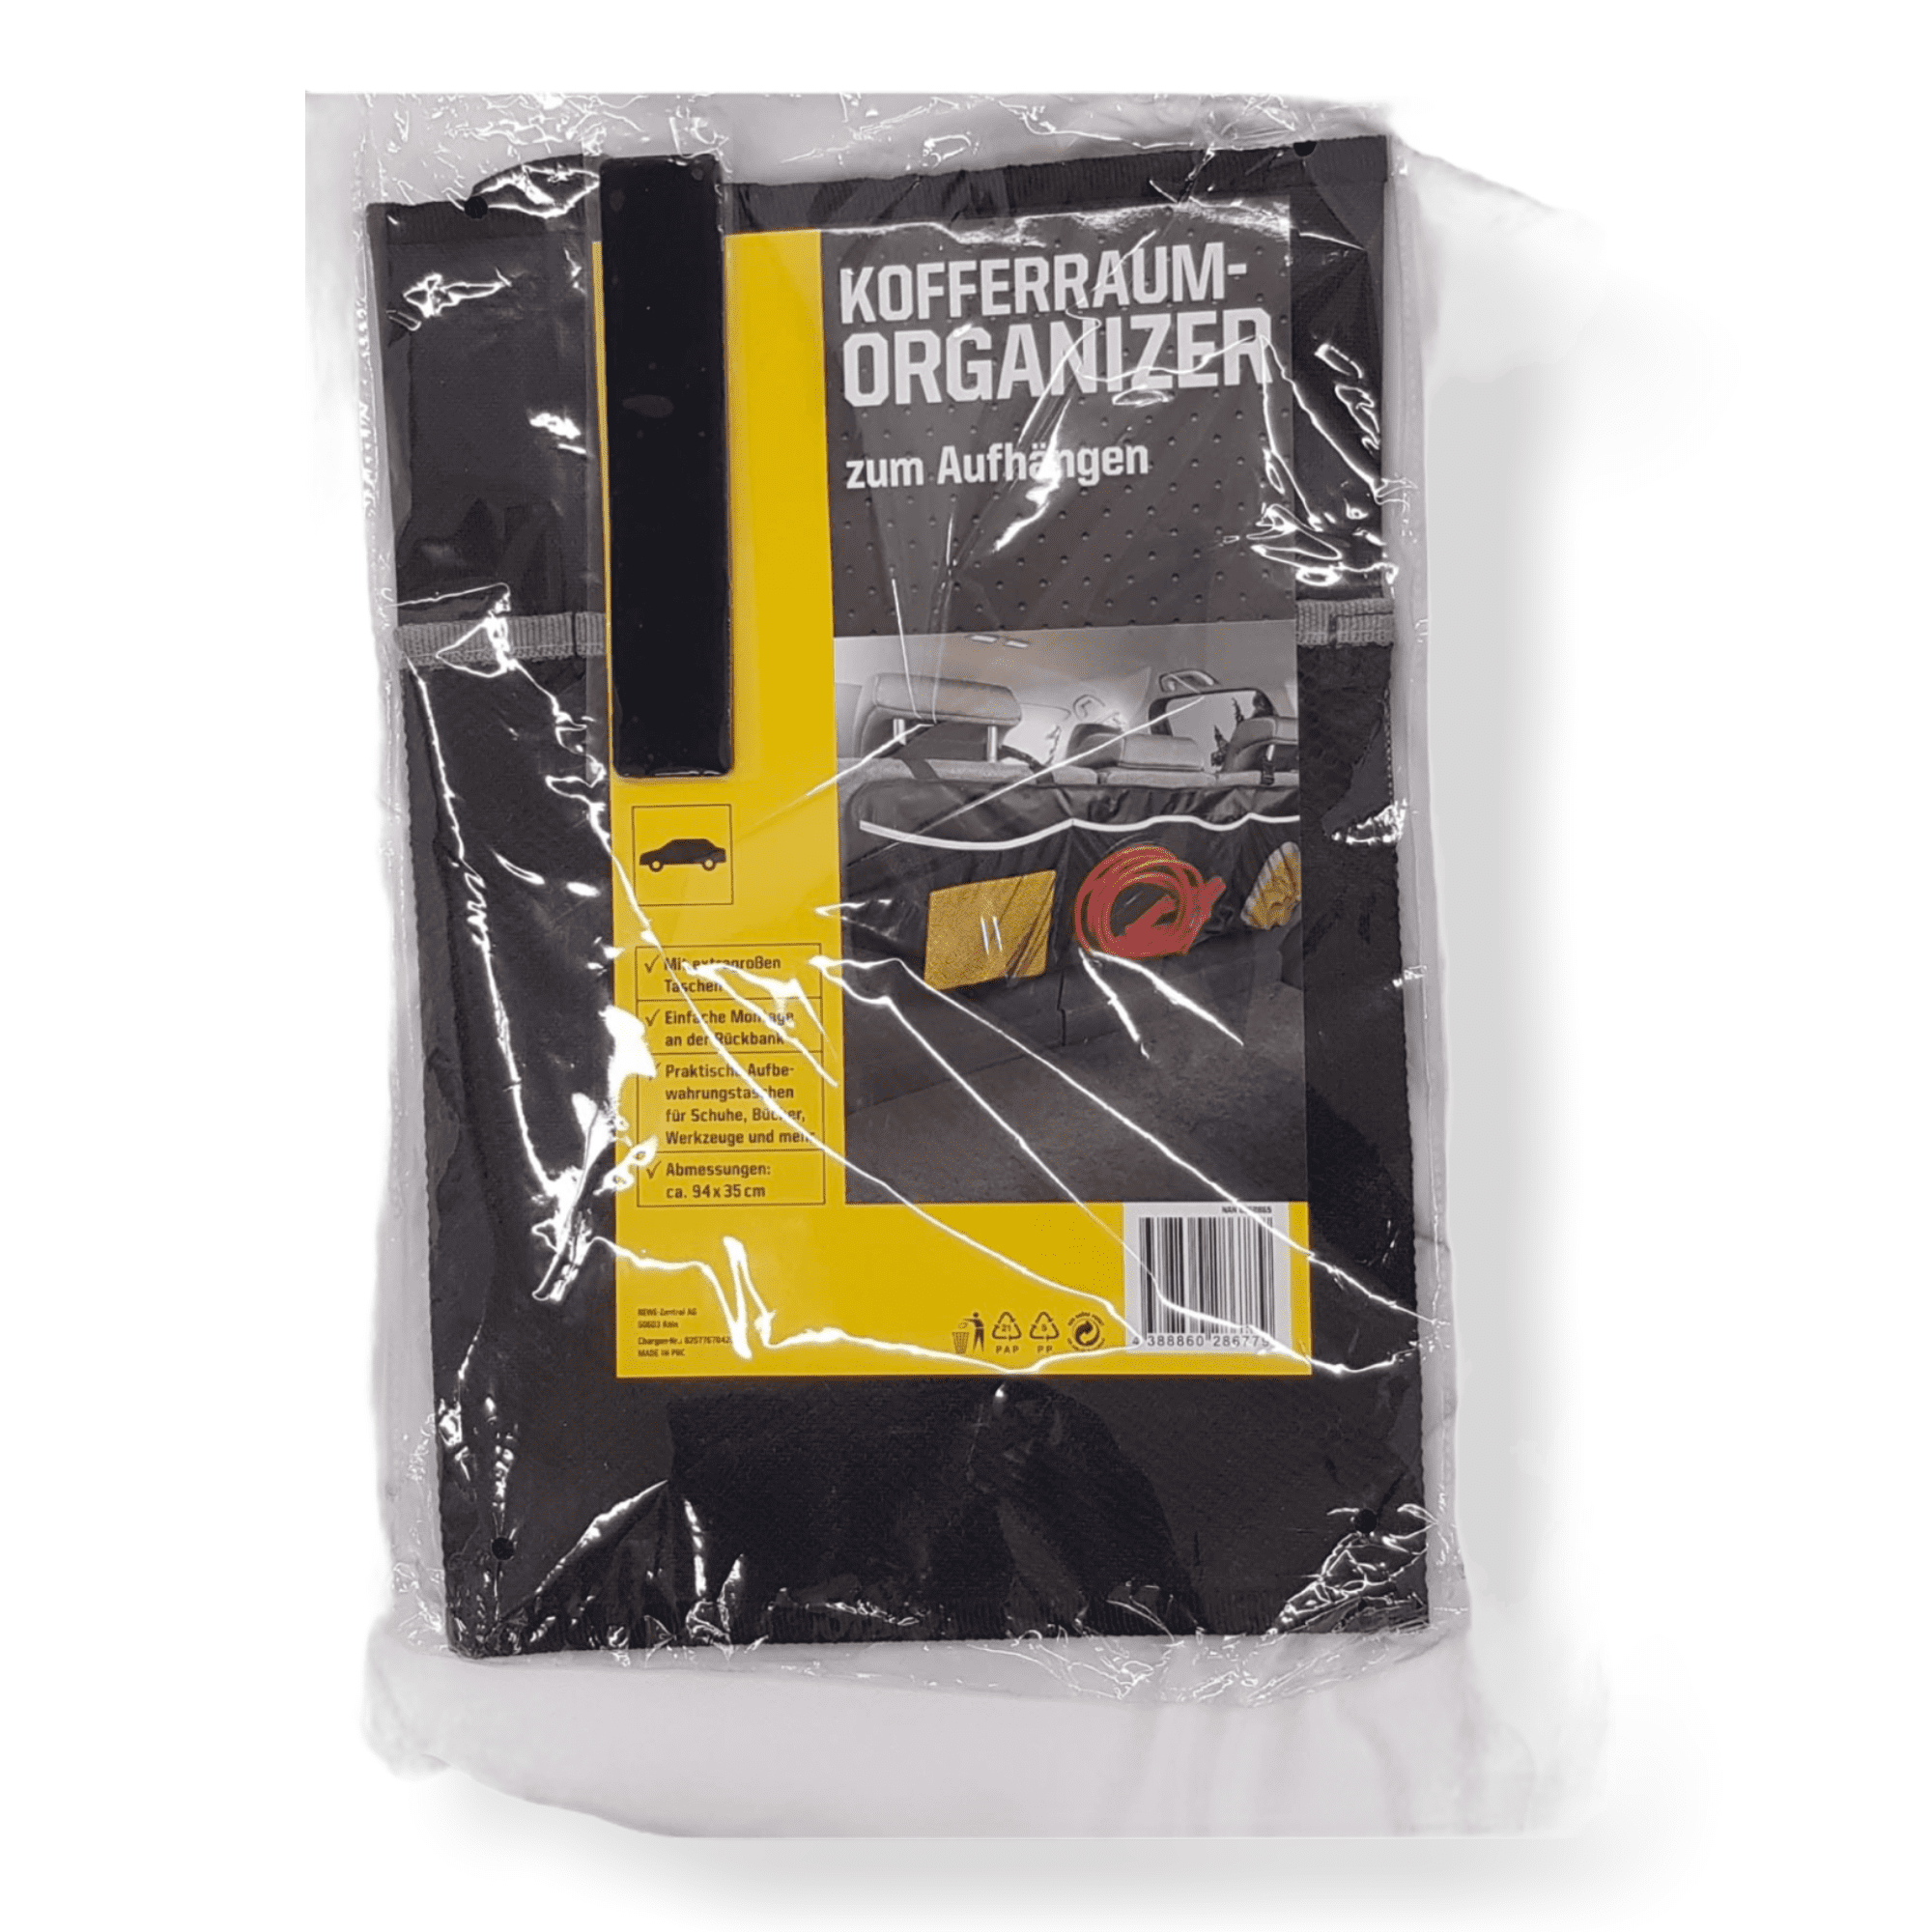 Kofferraum-Organizer 94x35cm